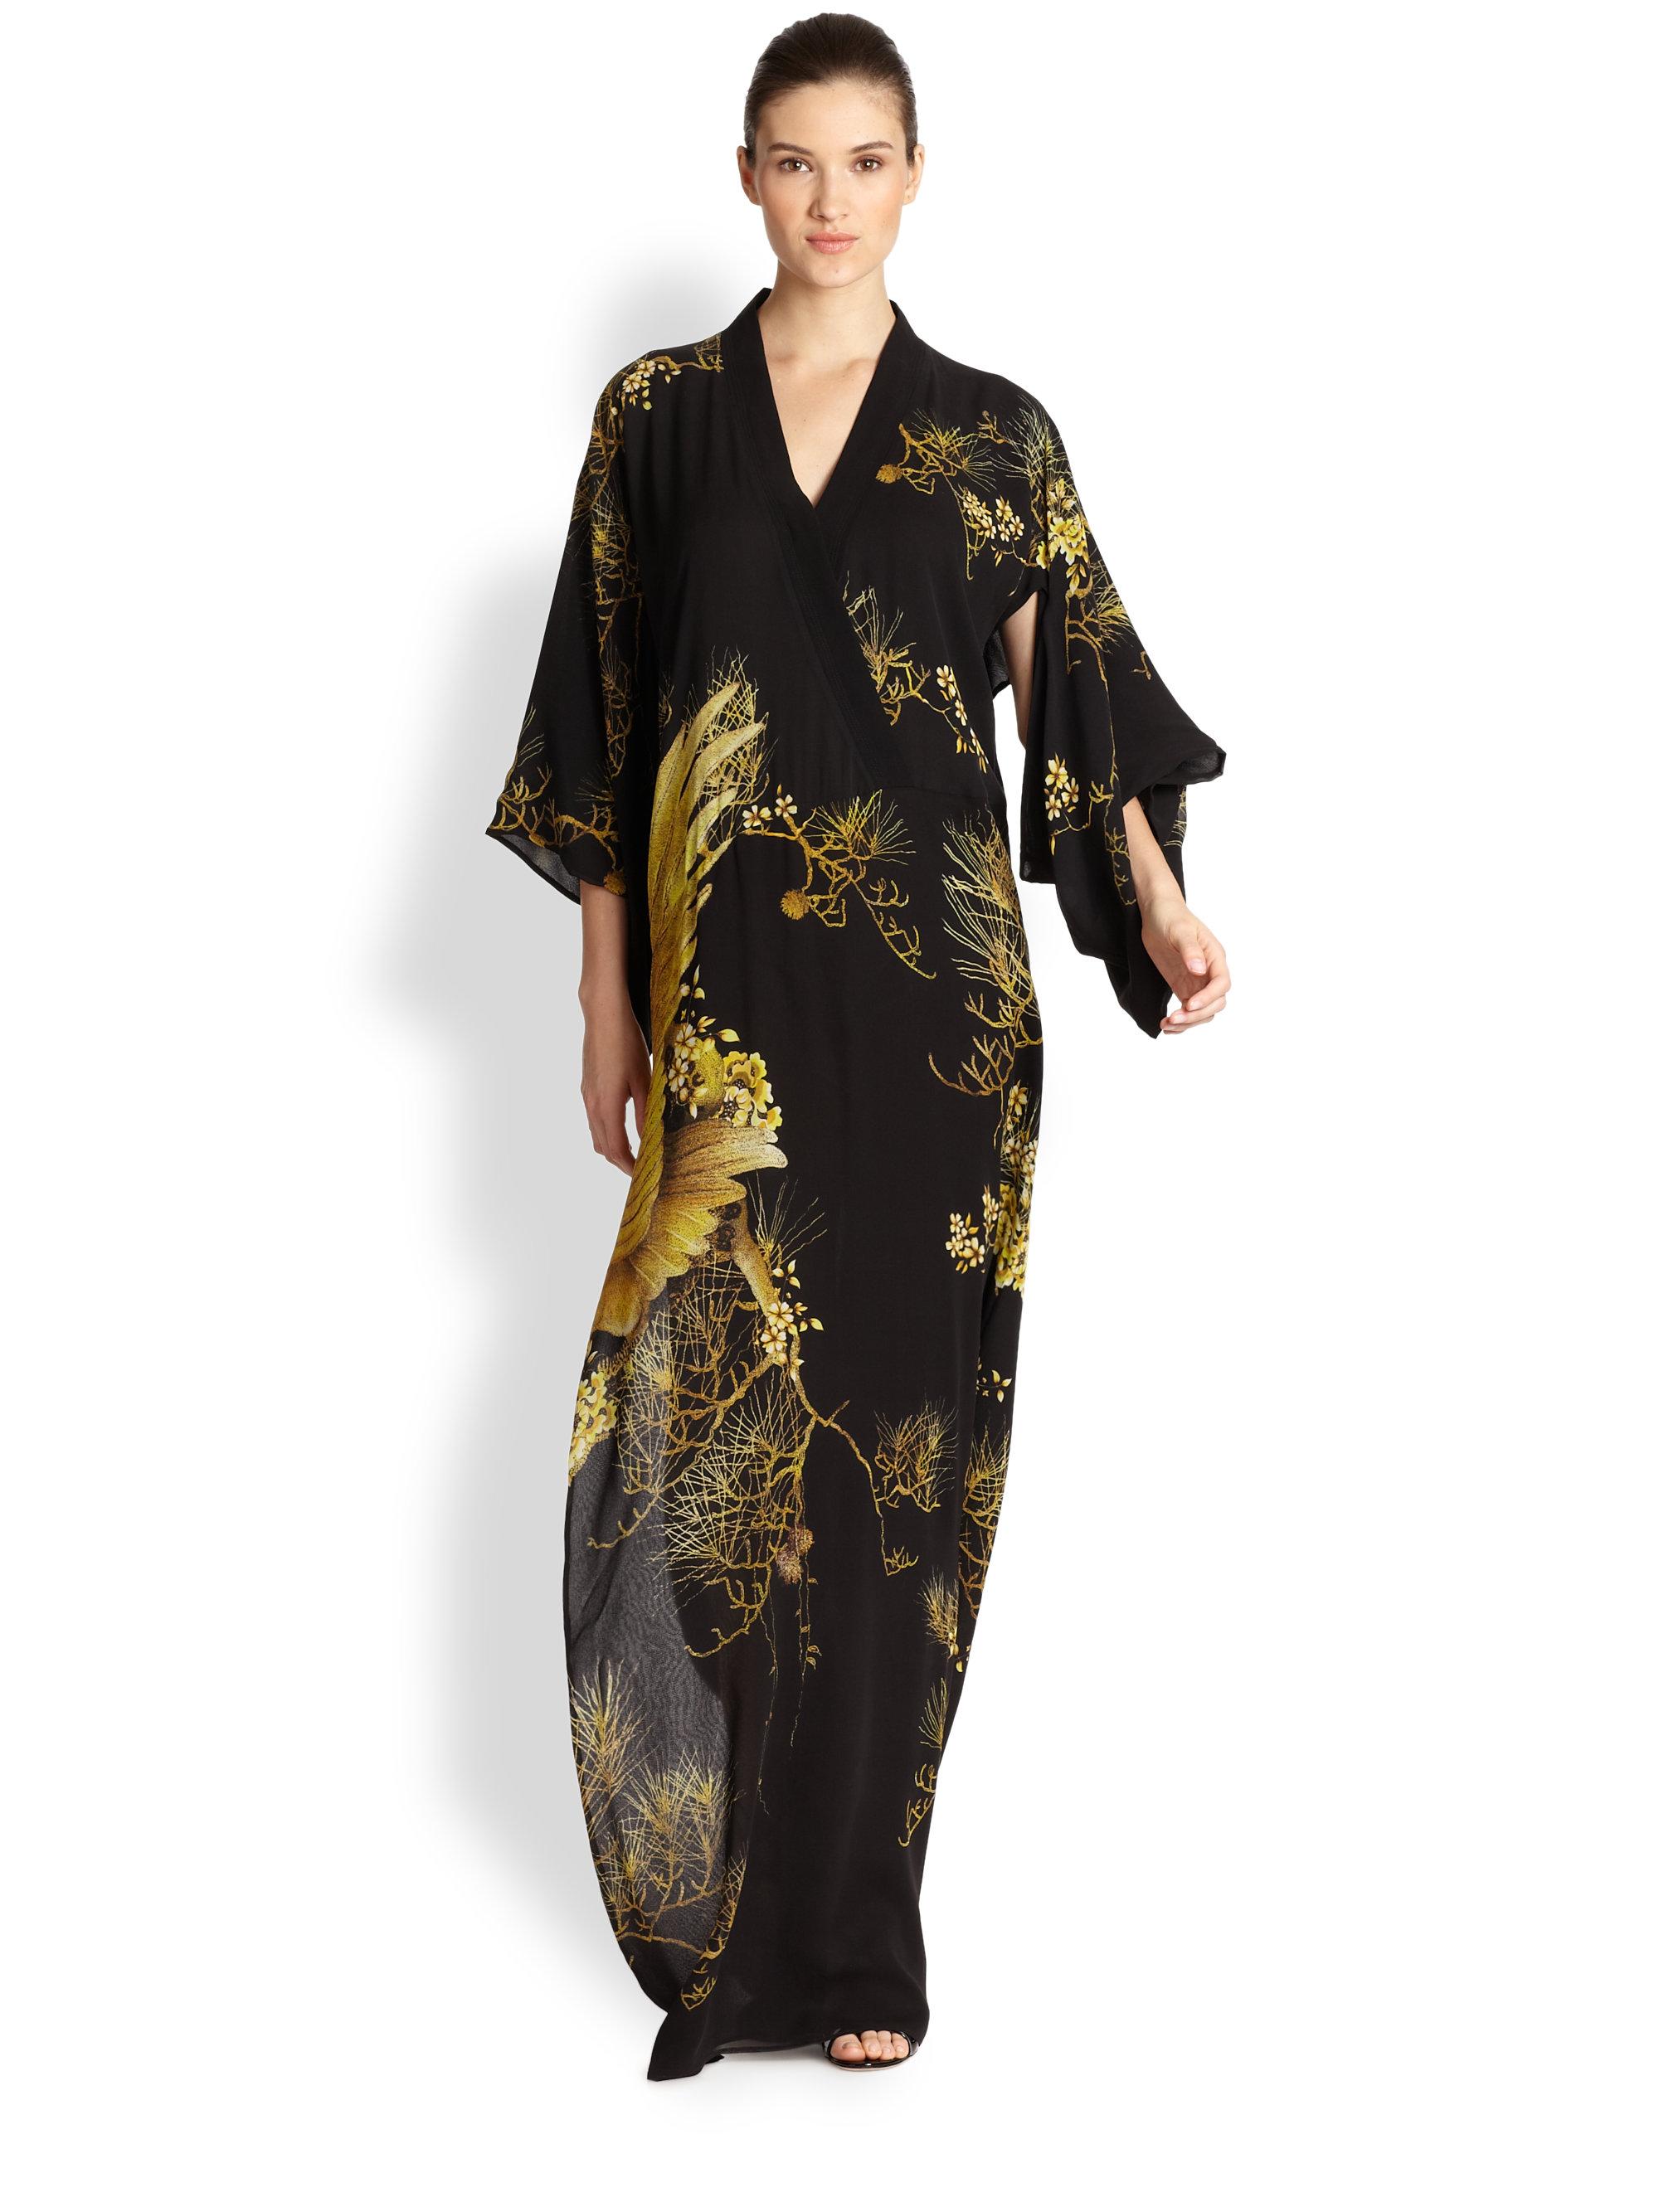 Lyst - Roberto Cavalli Printed Silk Kimono Gown in Black